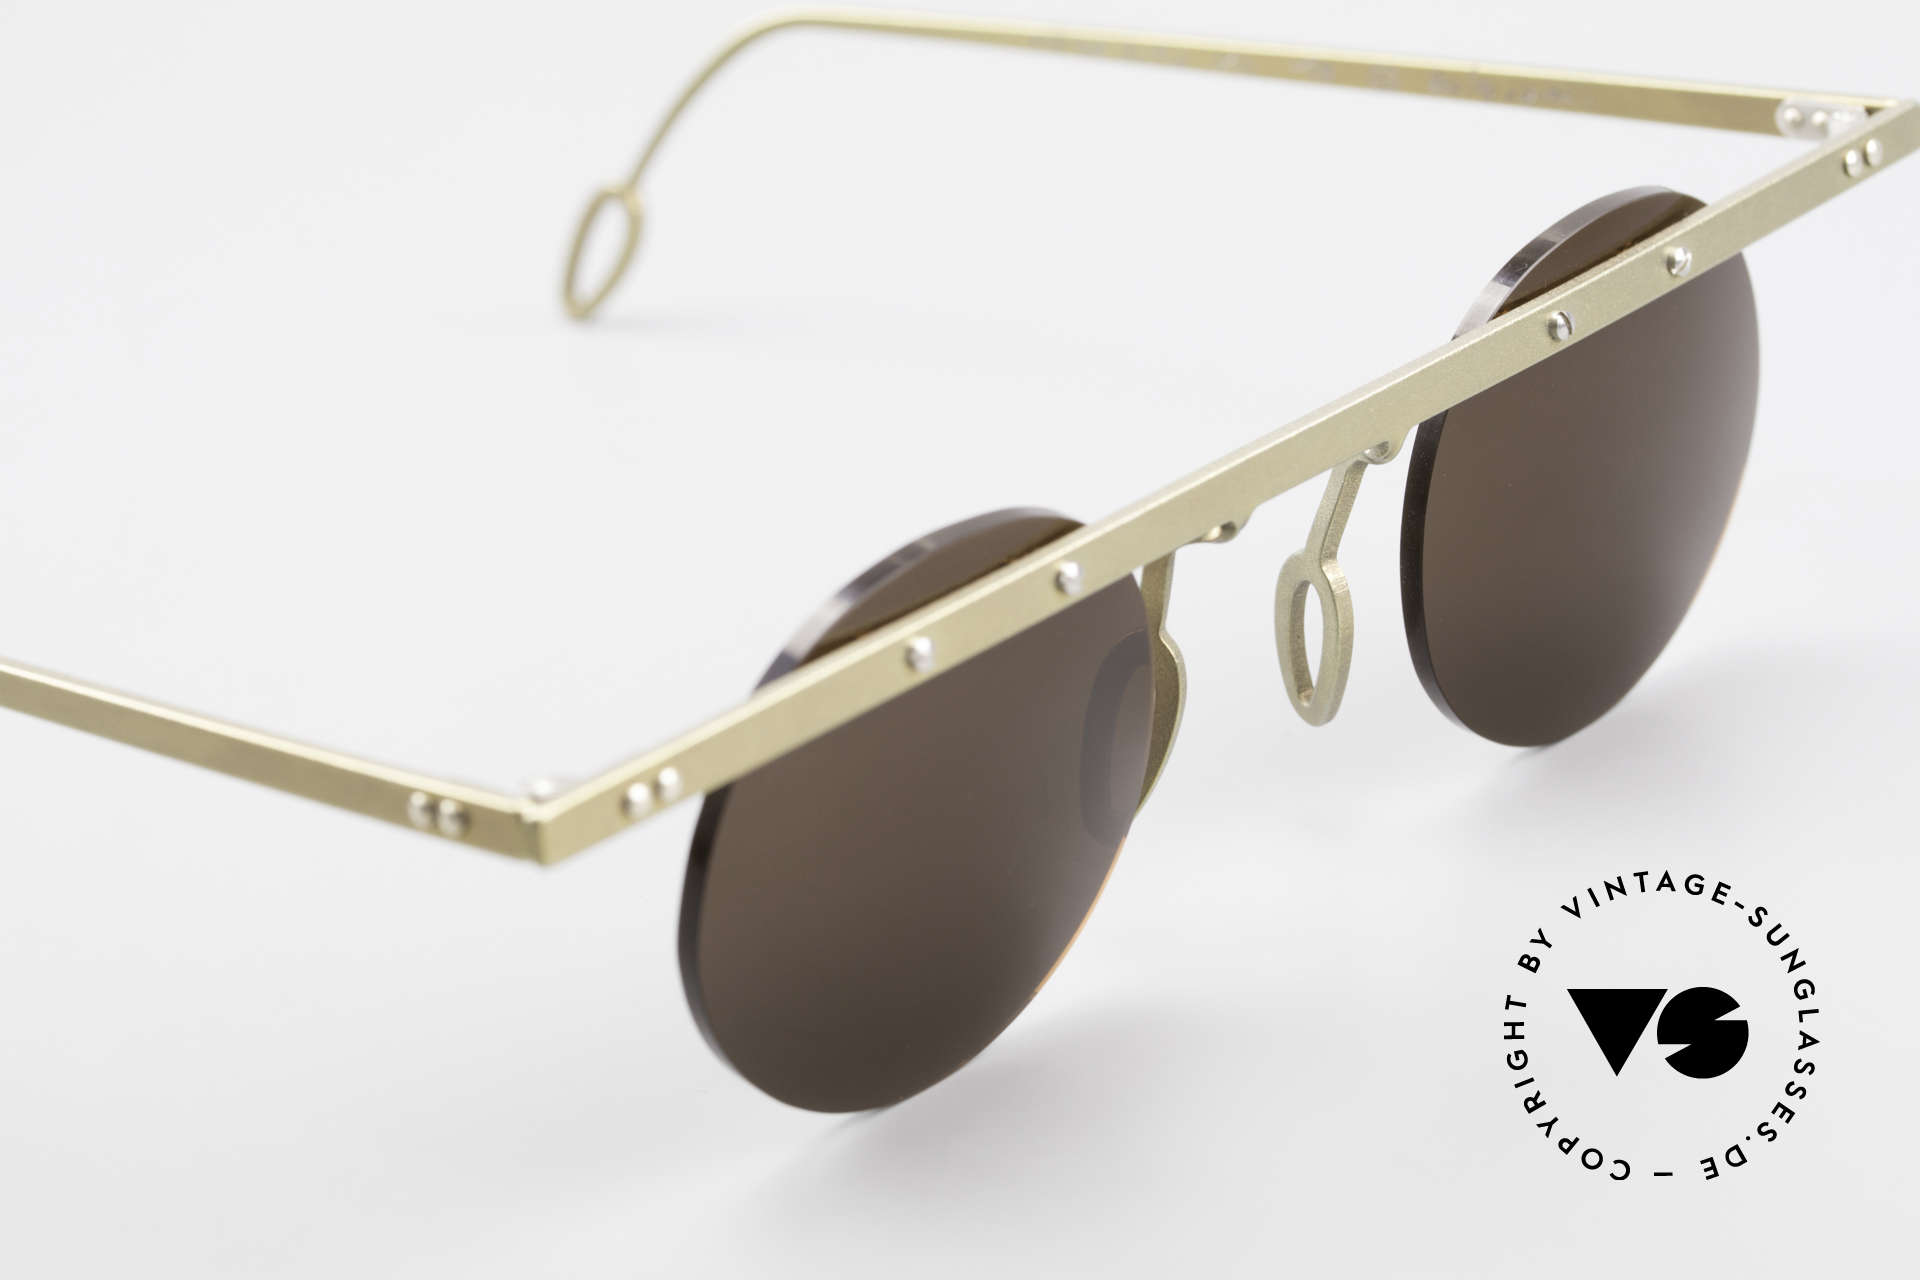 Theo Belgium Tita VII 10 Crazy Titanium Sunglasses 90s, an old, unworn THEO original and NO RETRO EYEWEAR, Made for Men and Women